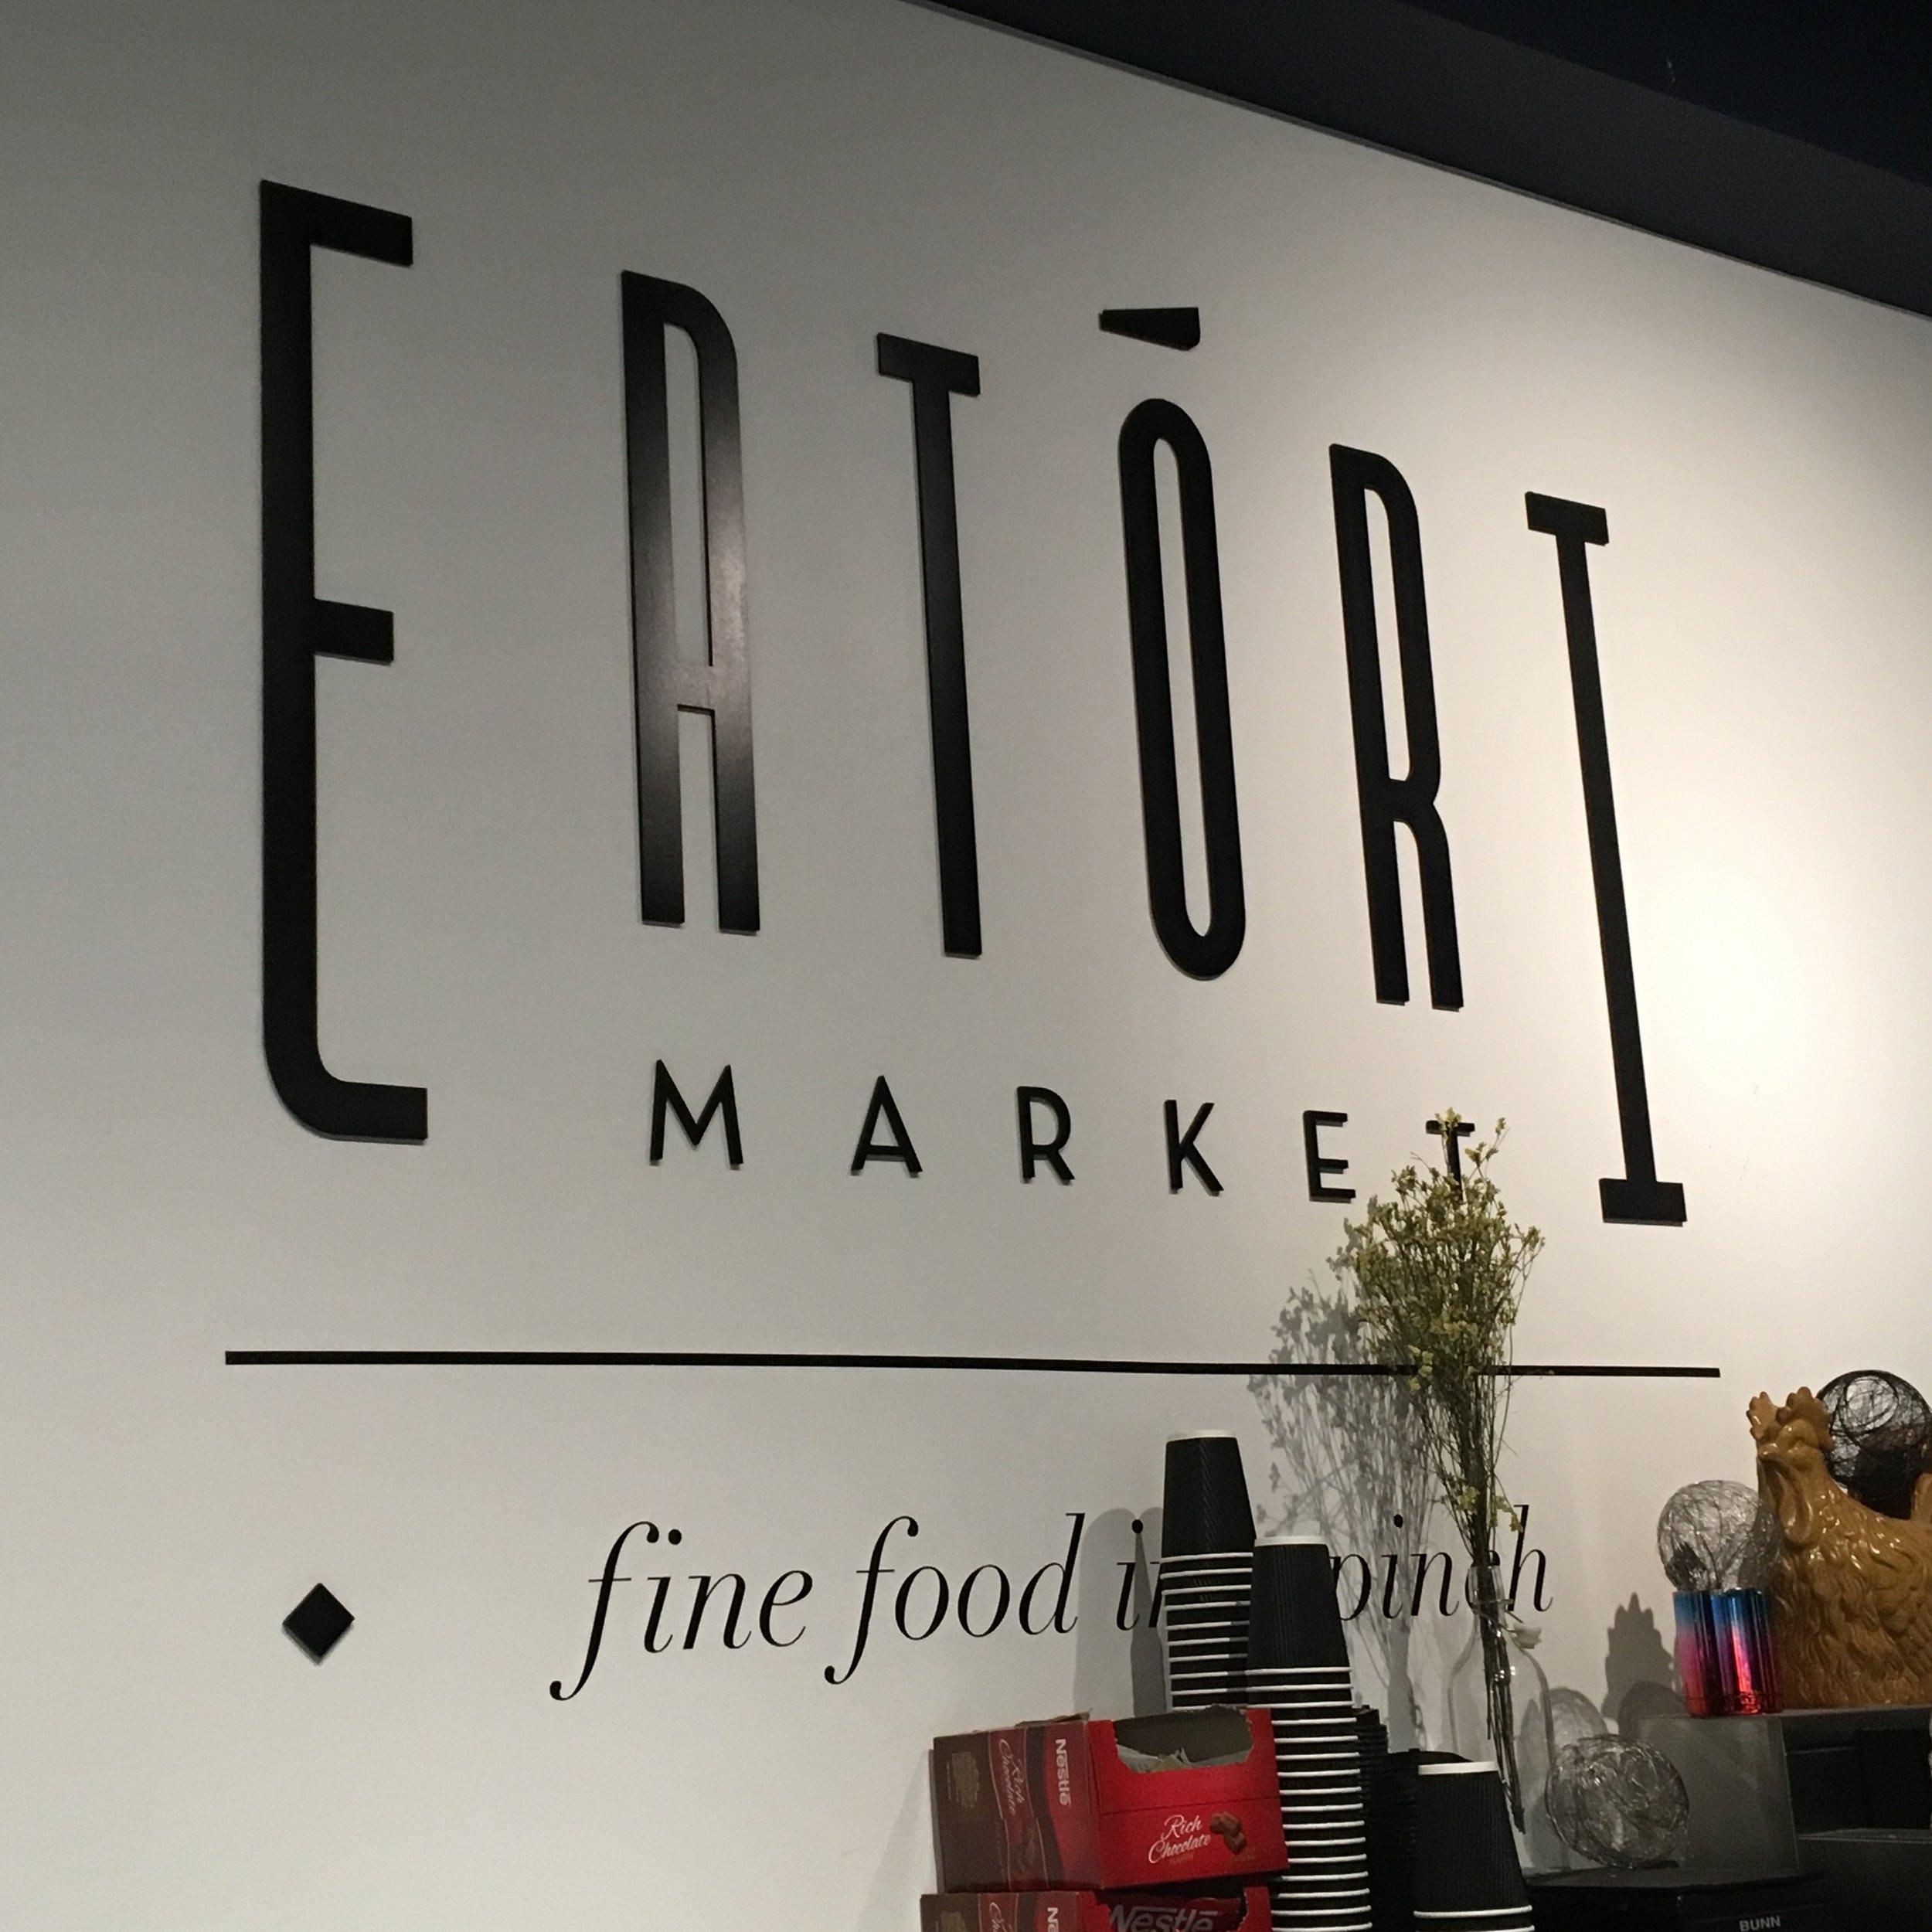 eatori-window-design4.jpeg